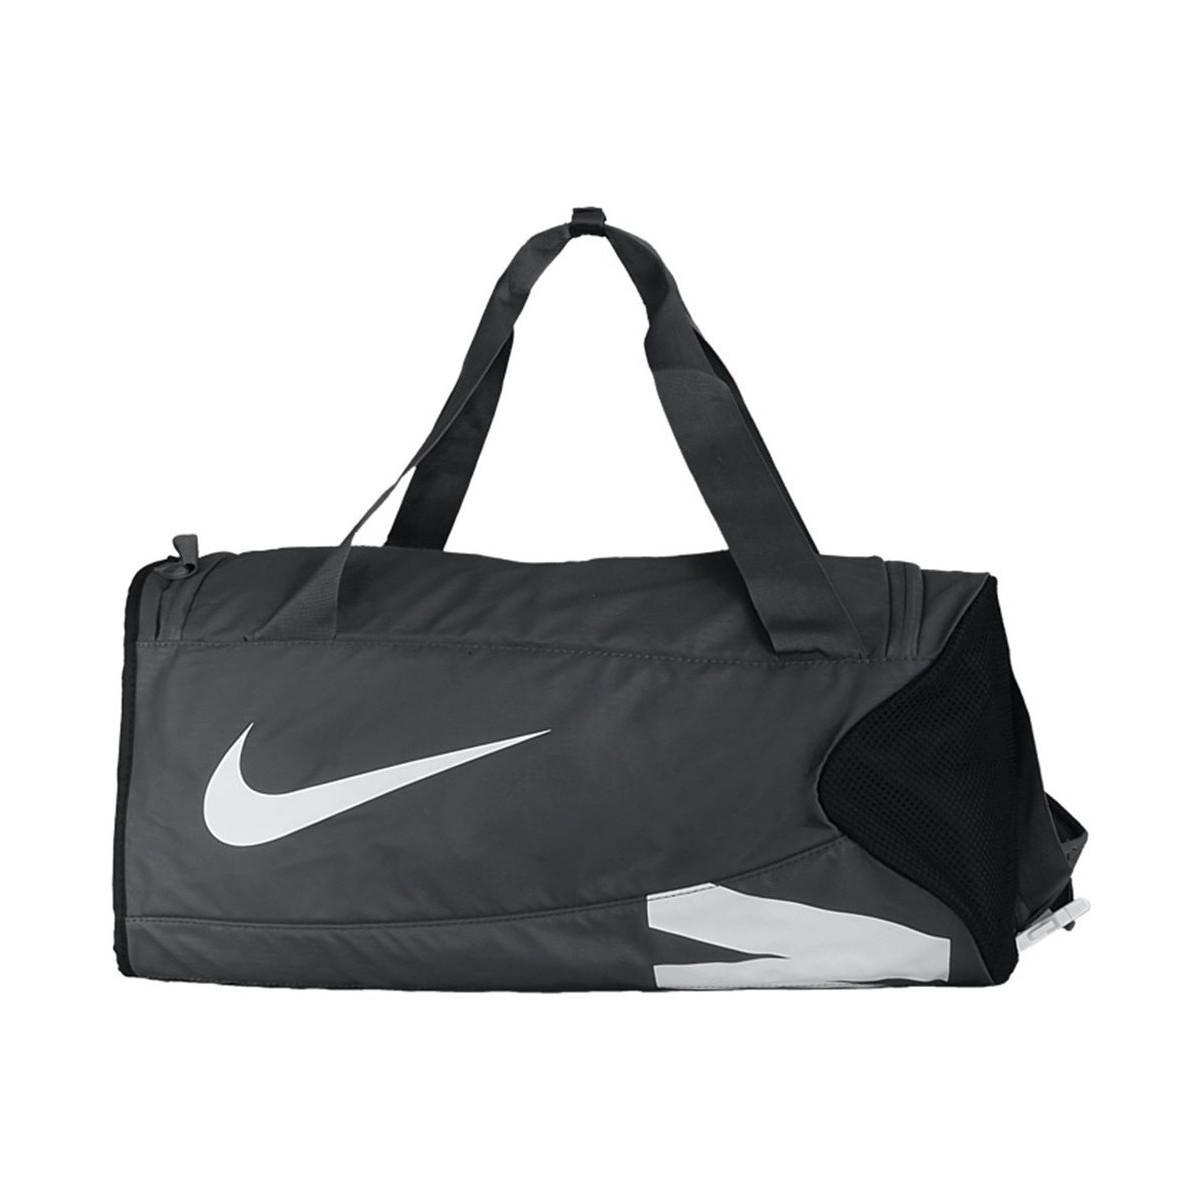 Nike Alpha Adapt Crossbody Women's Sports Bag In Grey in Grey